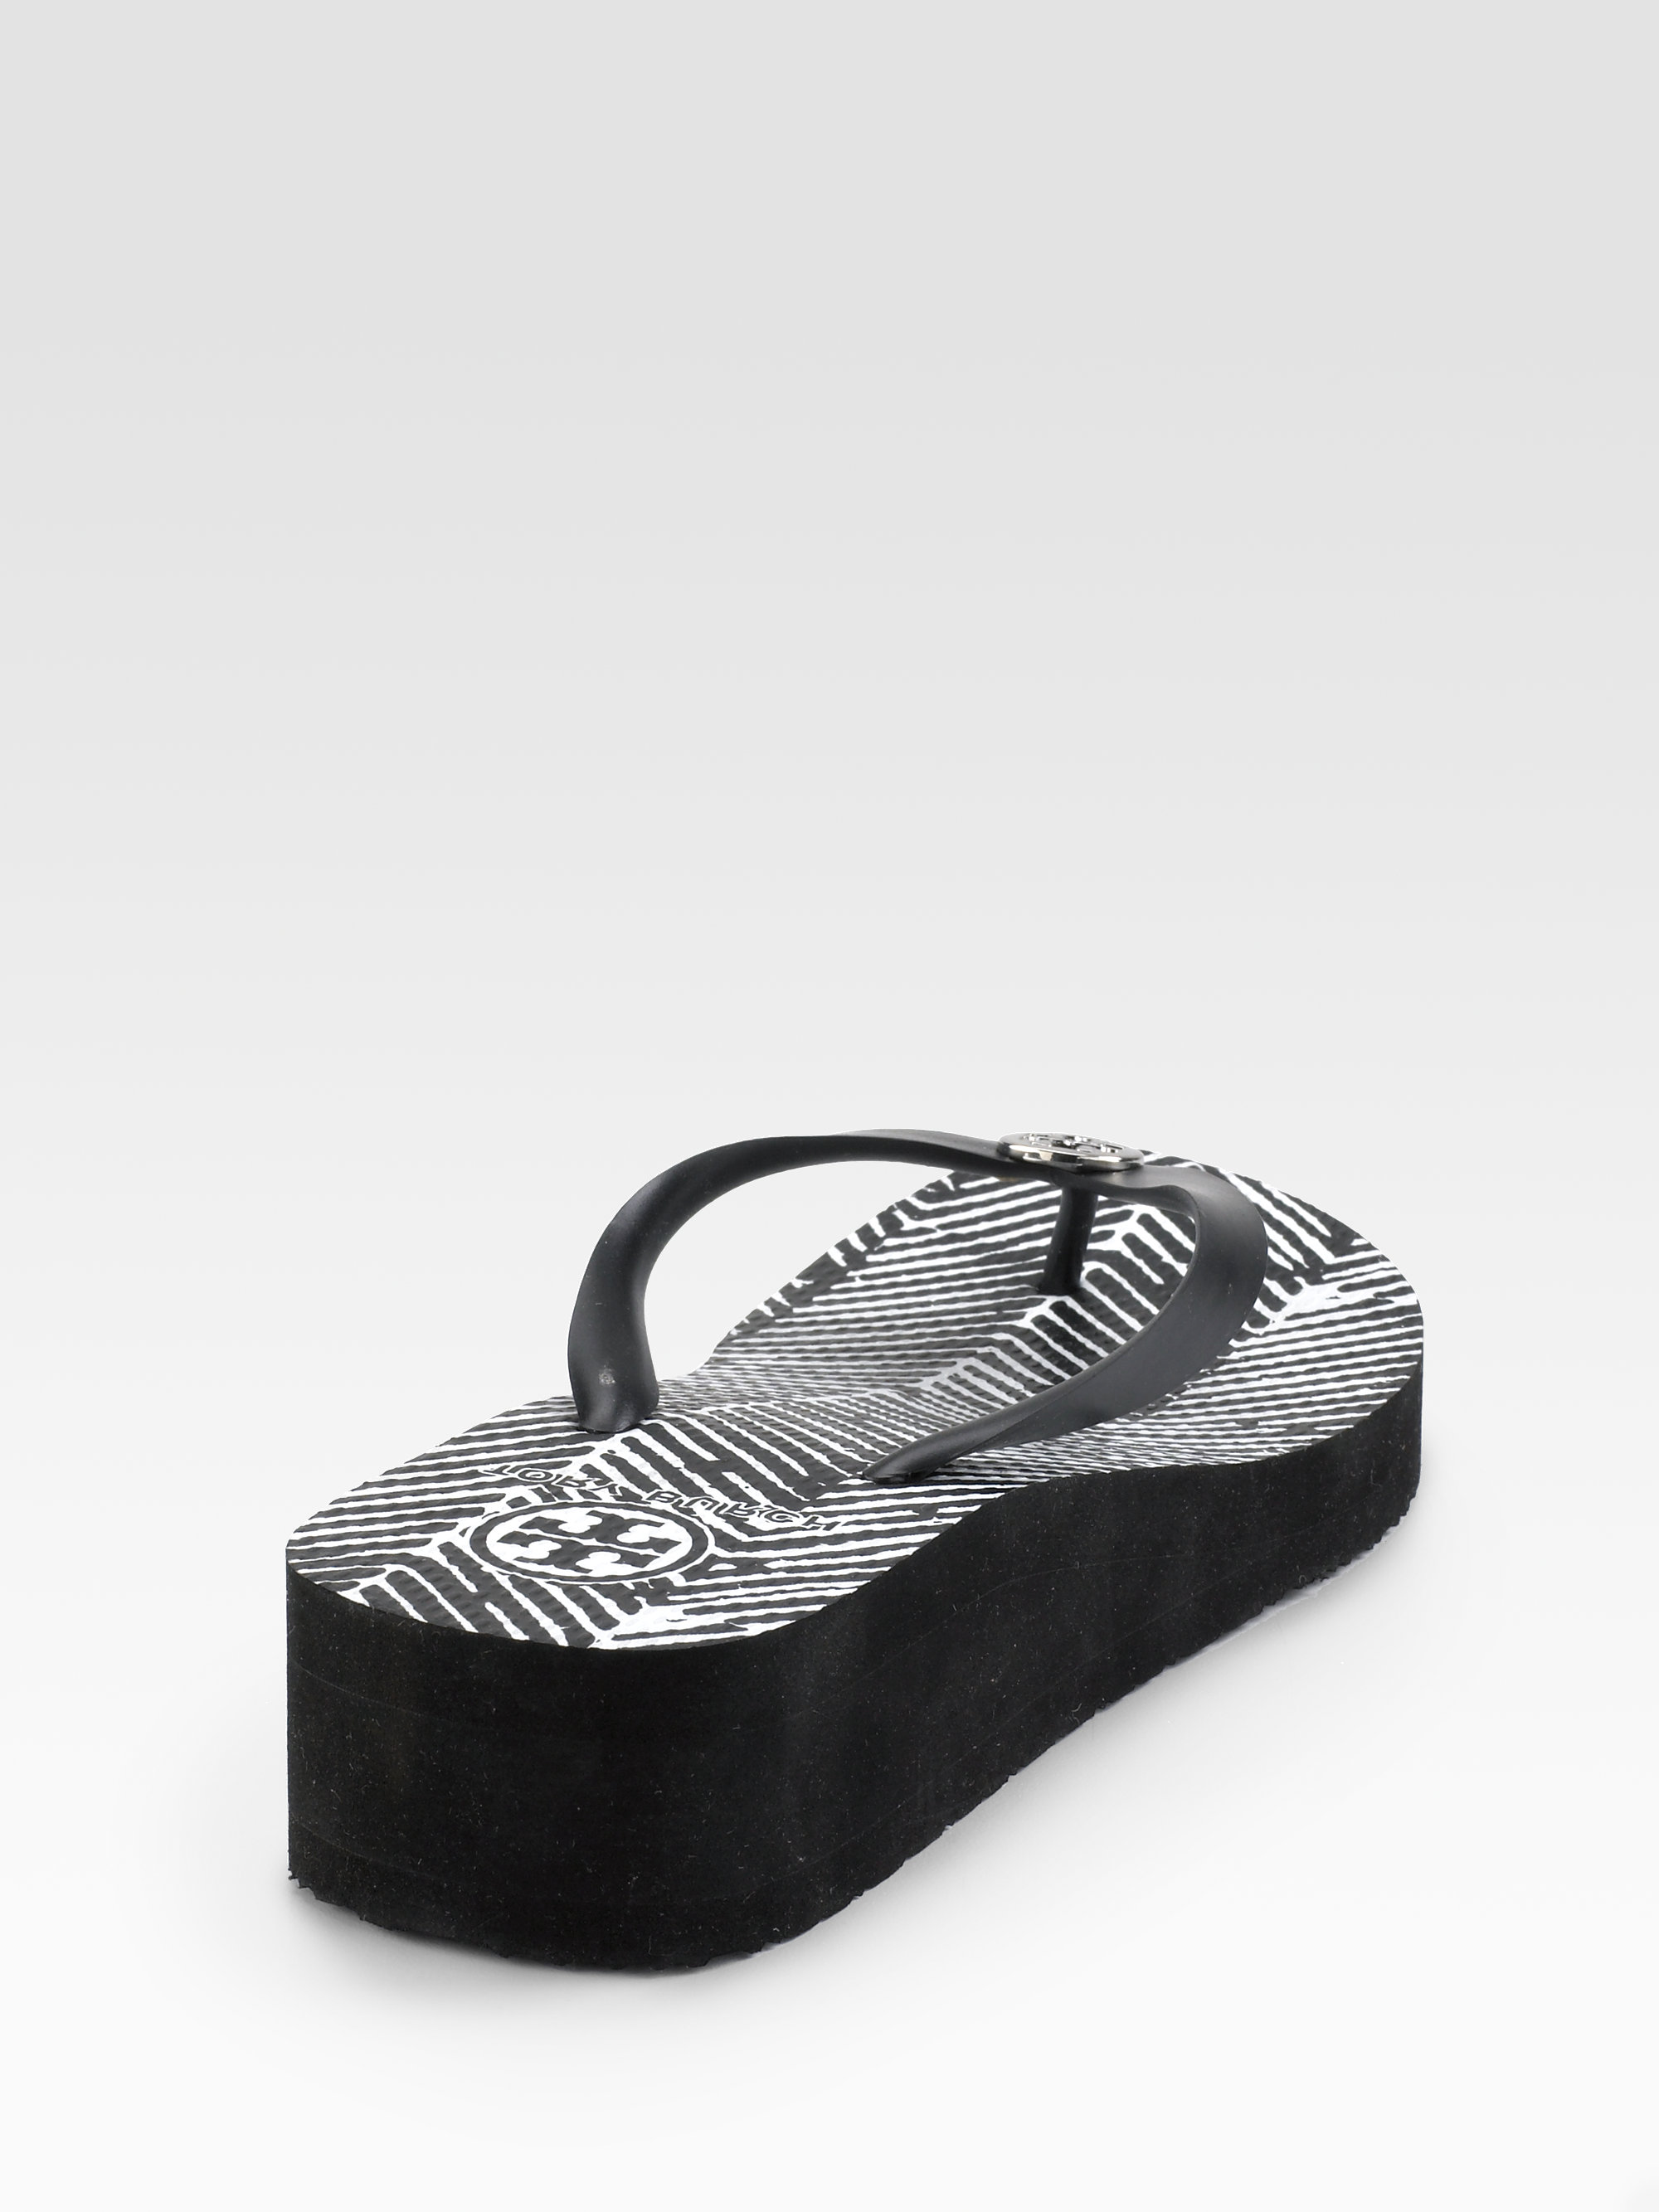 a08a8939f Lyst - Tory Burch Rubber Wedge Flip Flops in Black